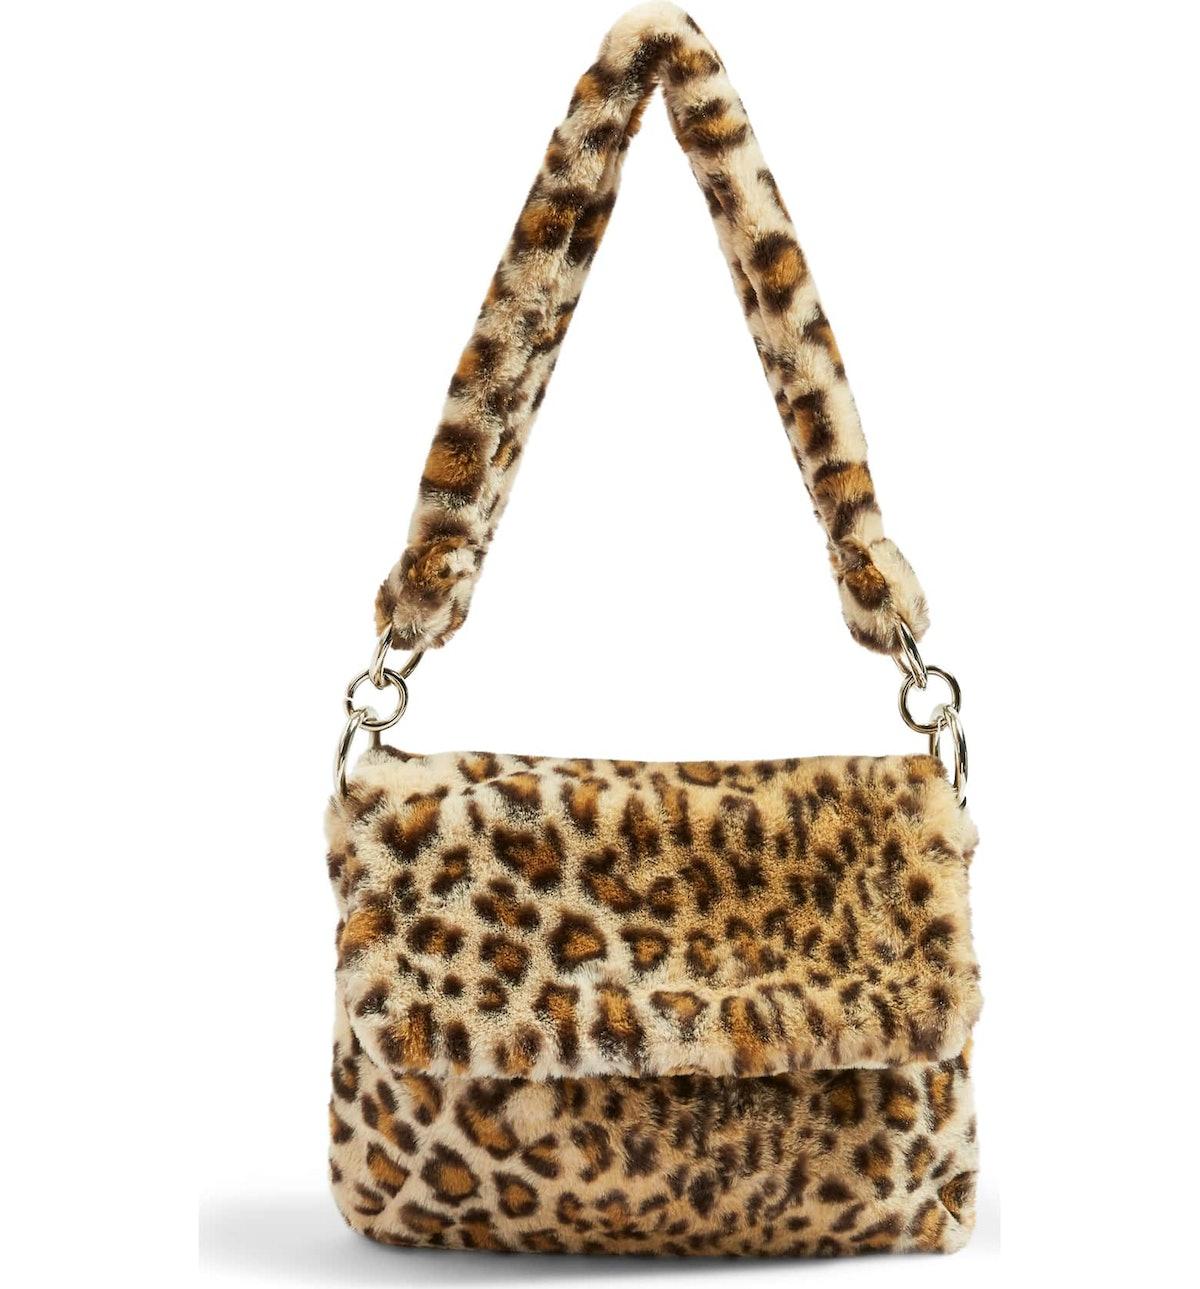 Teddy Leopard Print Faux Fur Shoulder Bag